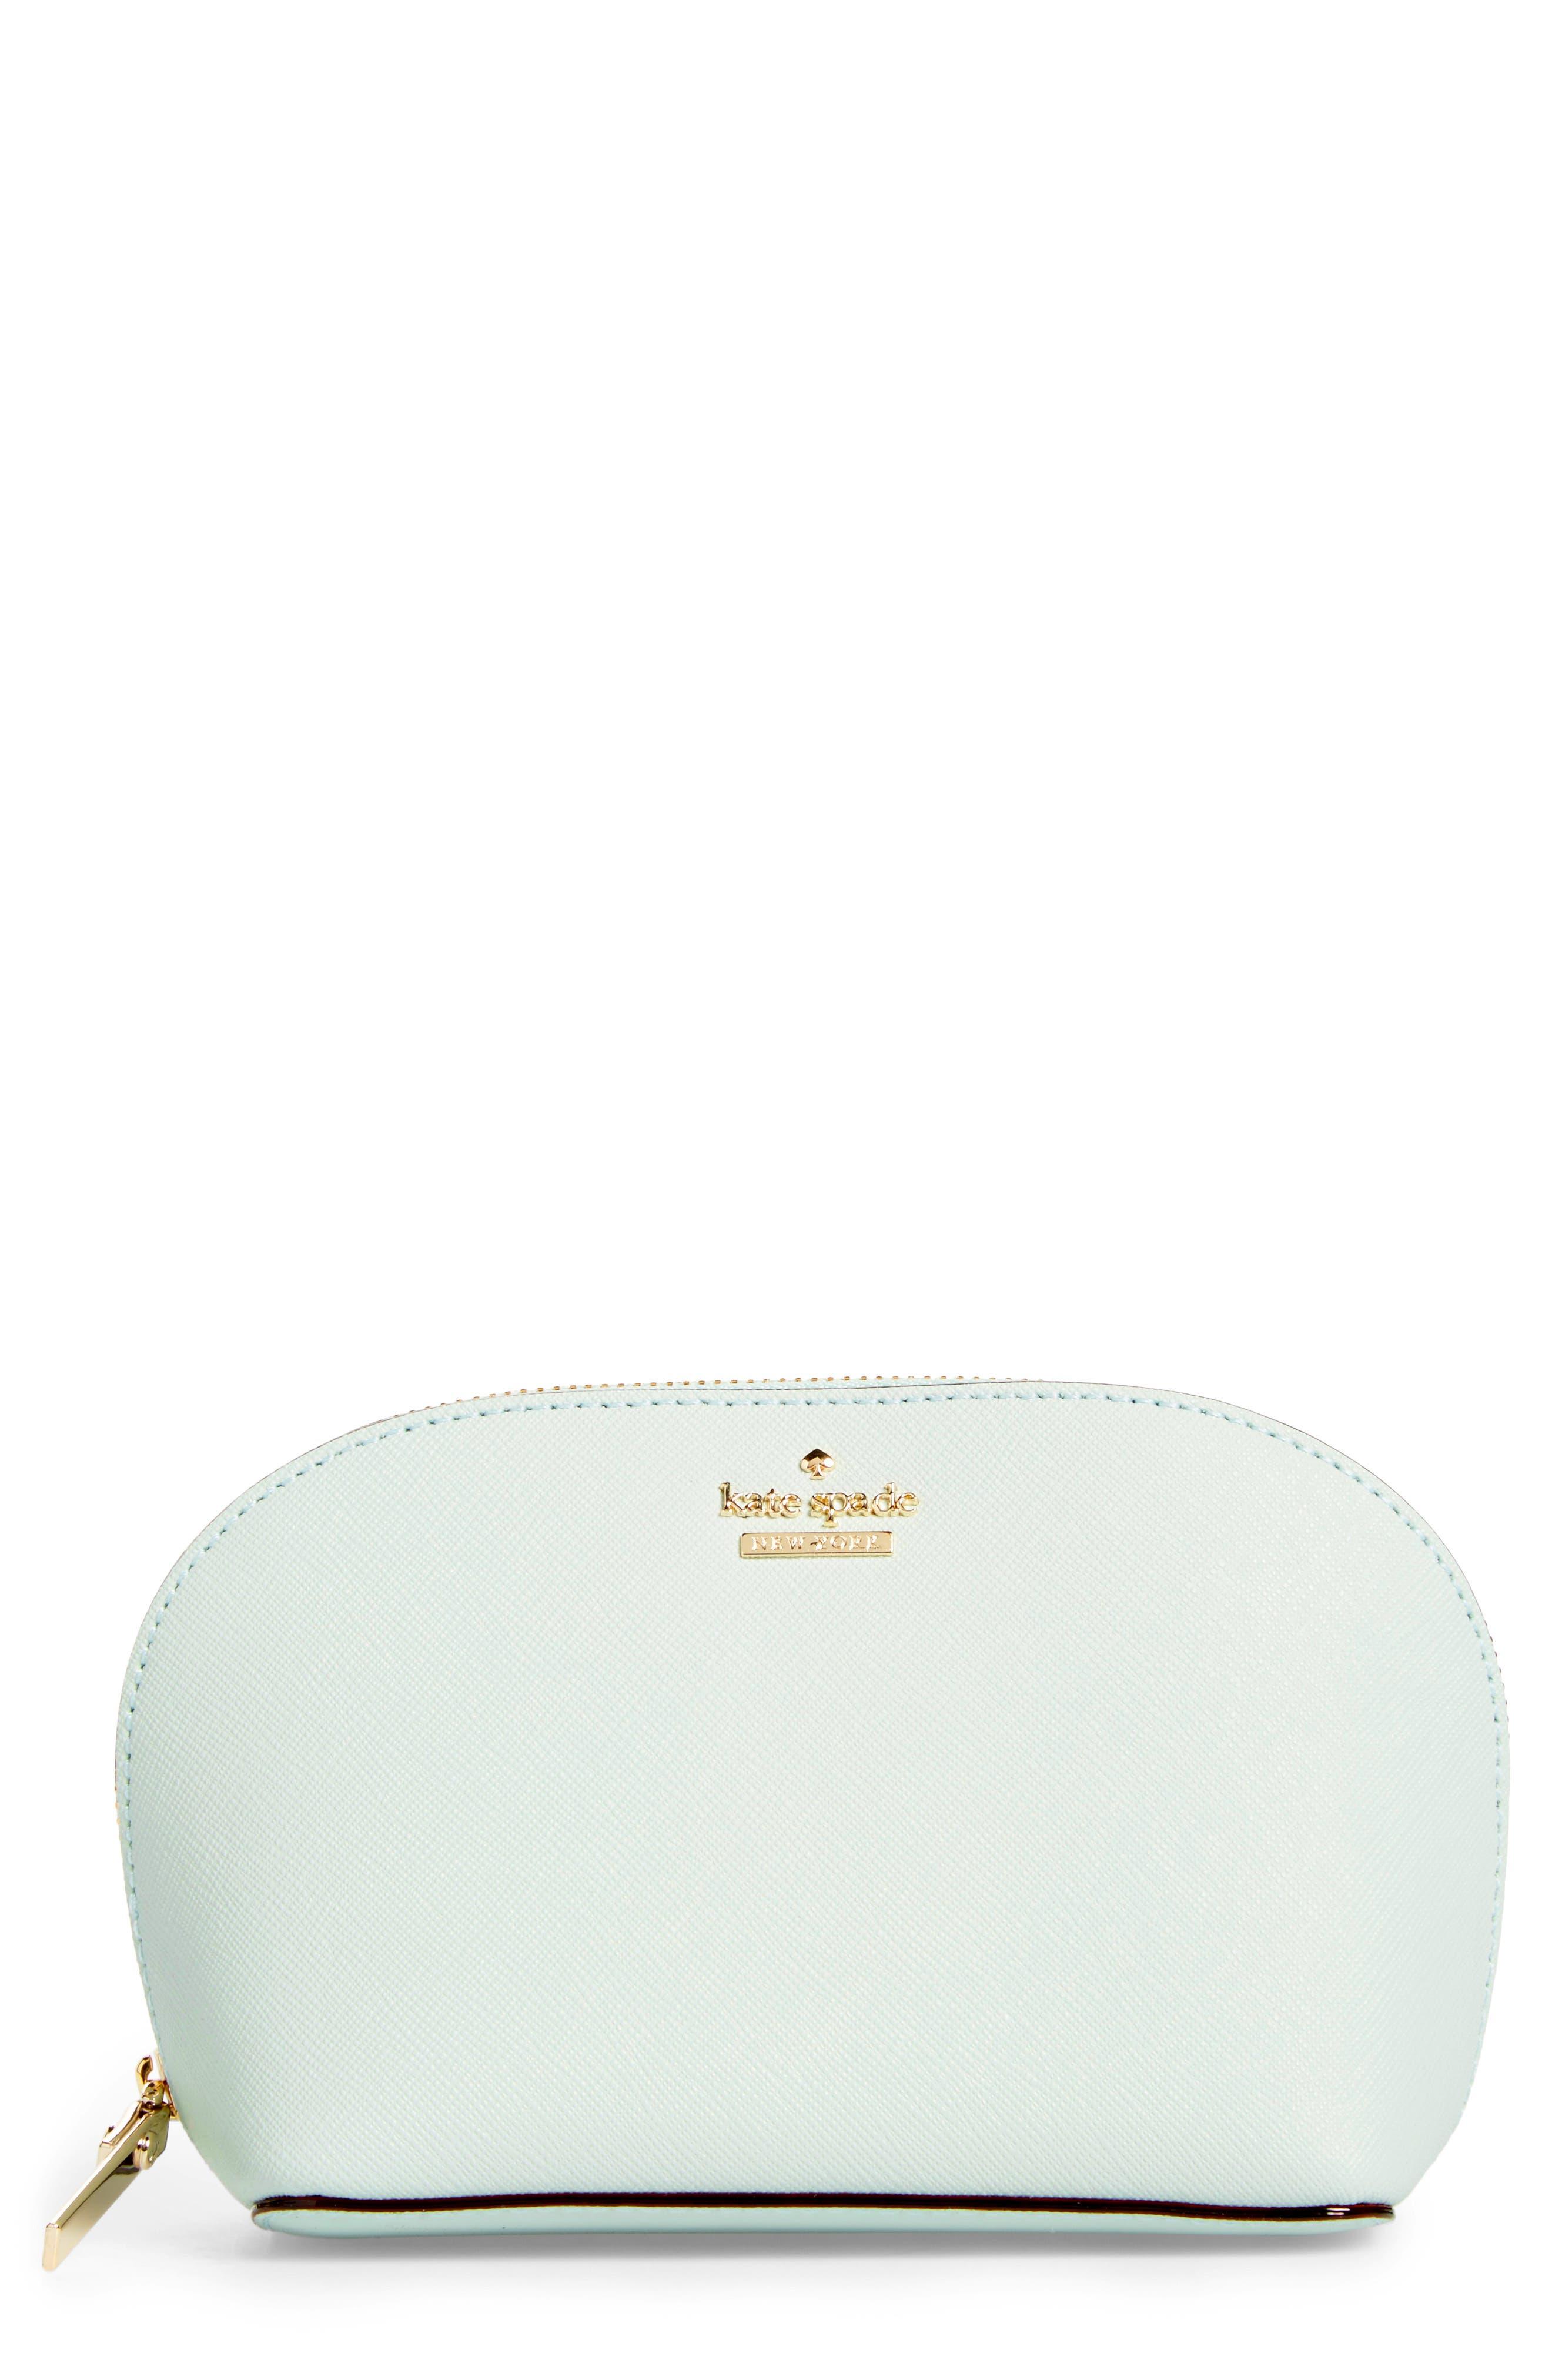 cameron street - small abalene leather cosmetics bag,                         Main,                         color, 302